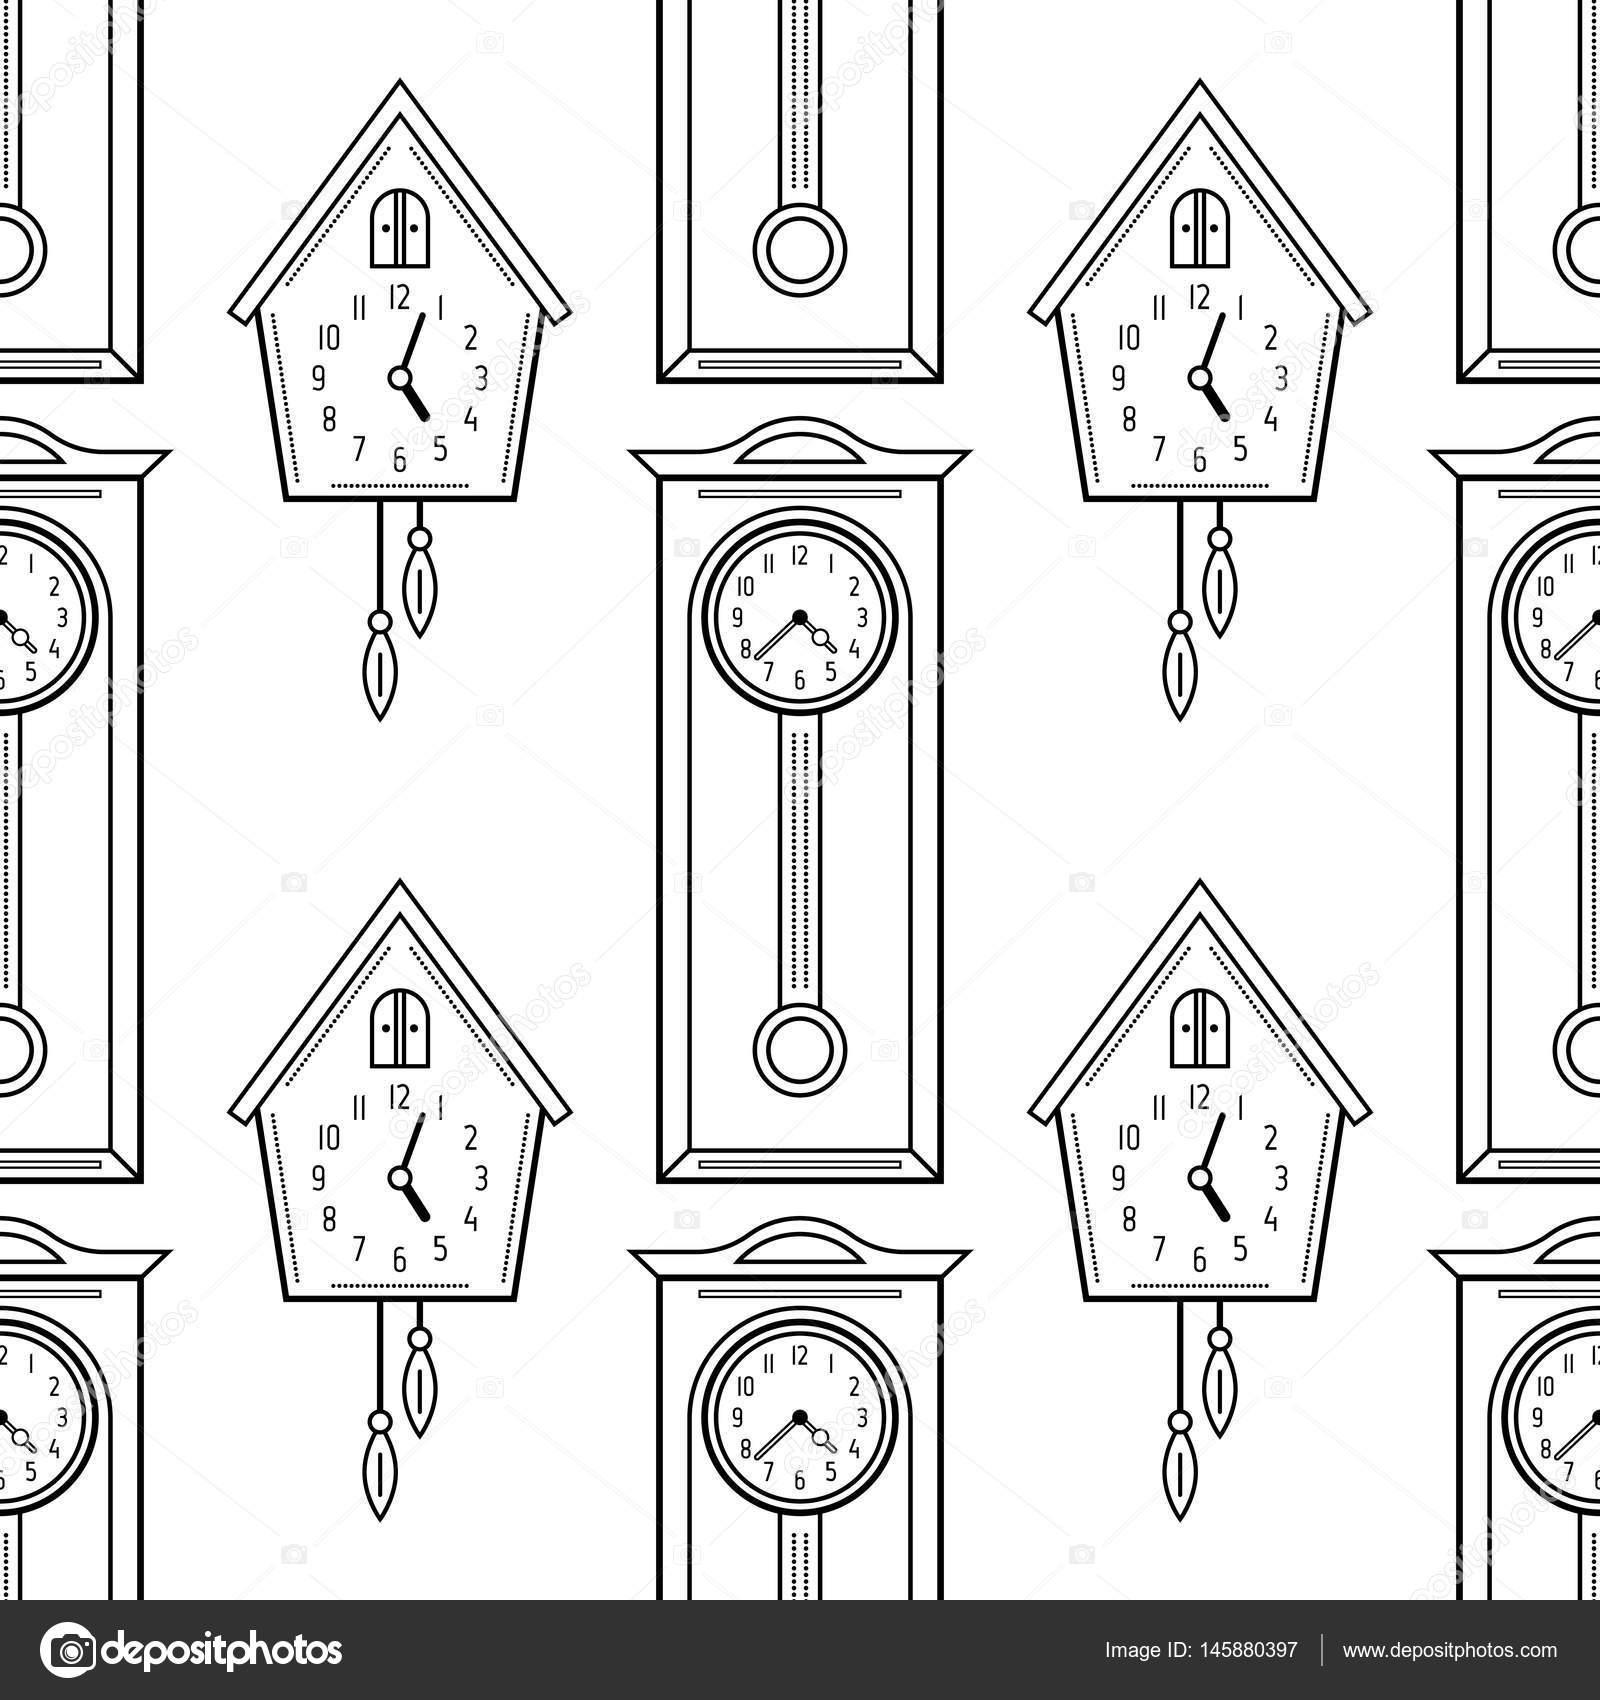 Reloj y reloj de abuelo, objetos planos lineales. Patrón ...